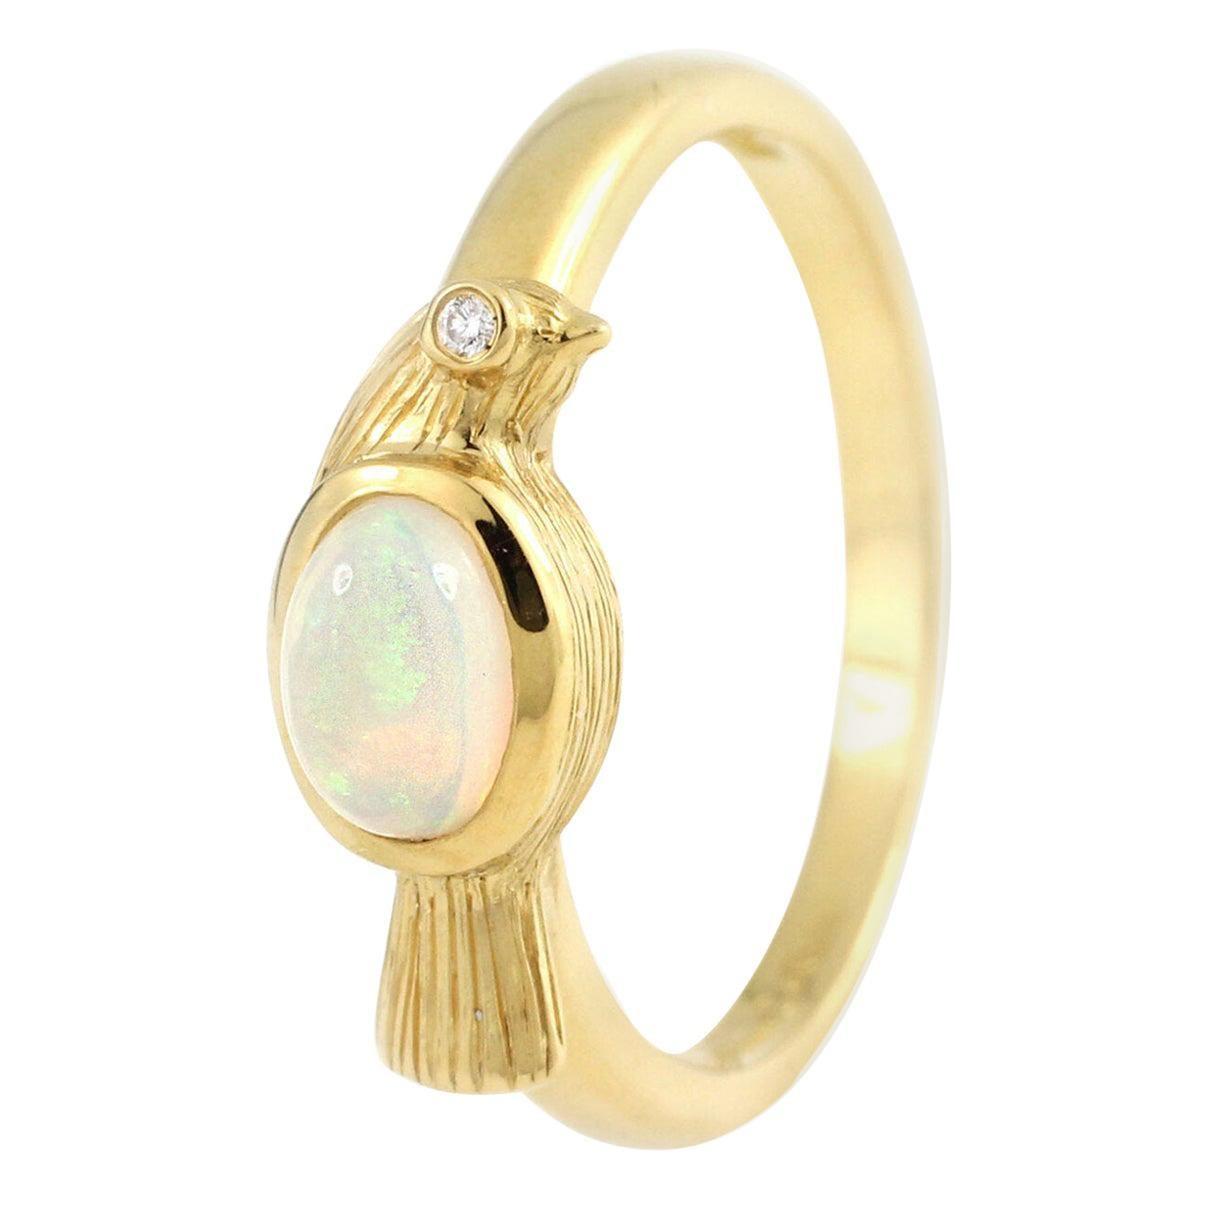 Julius Cohen Opal Bird Ring in 22 Karat Gold